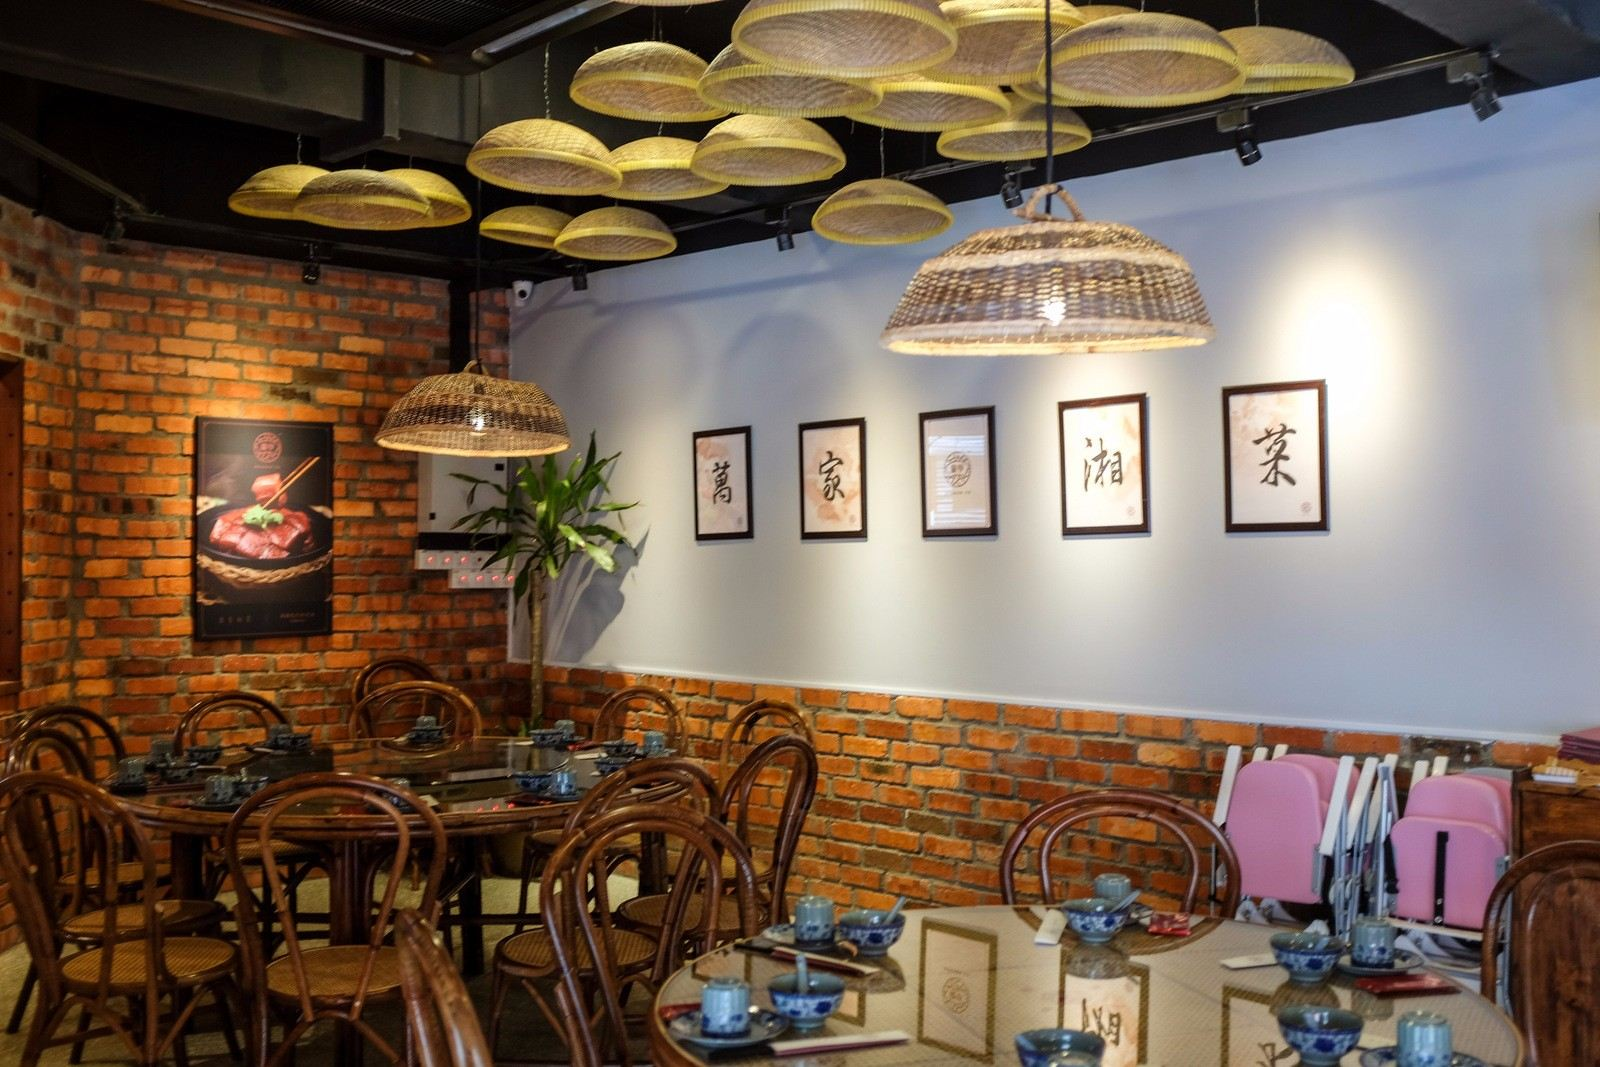 Rattan Art Supplies To Dragon Co. Hunan Restaurant